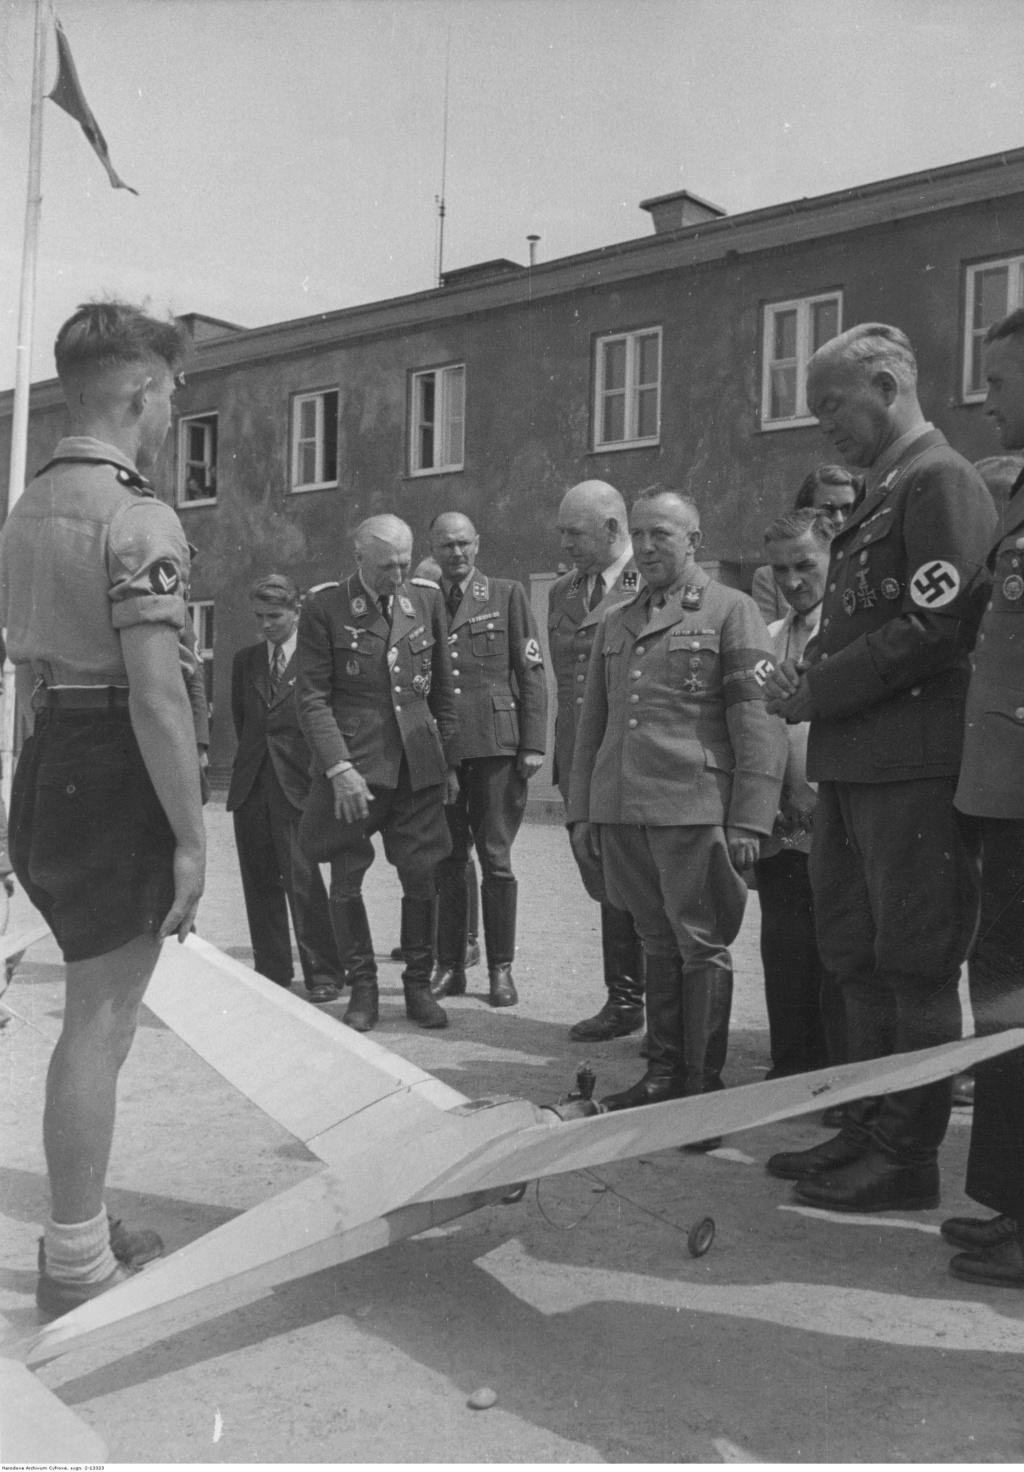 Diverses photos de la WWII - Page 5 91914